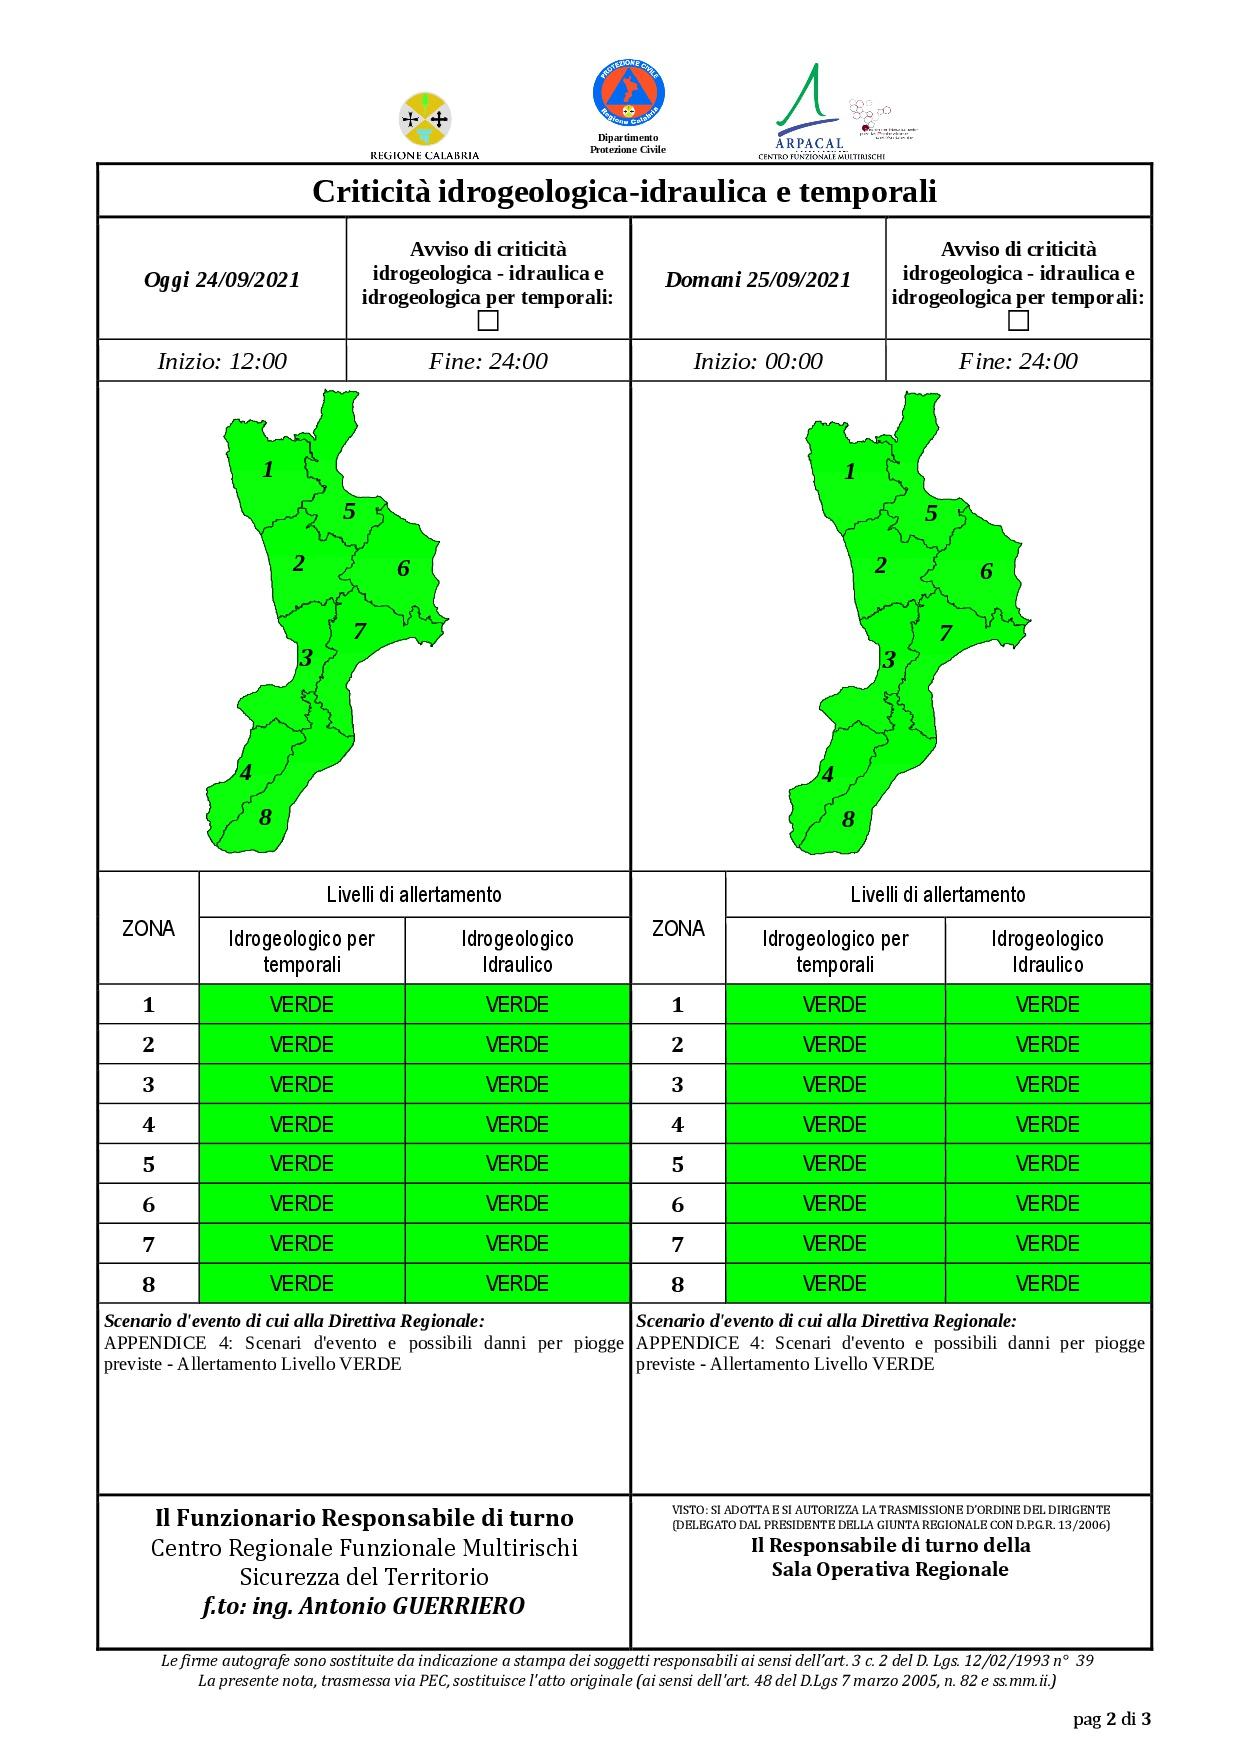 Criticità idrogeologica-idraulica e temporali in Calabria 24-09-2021